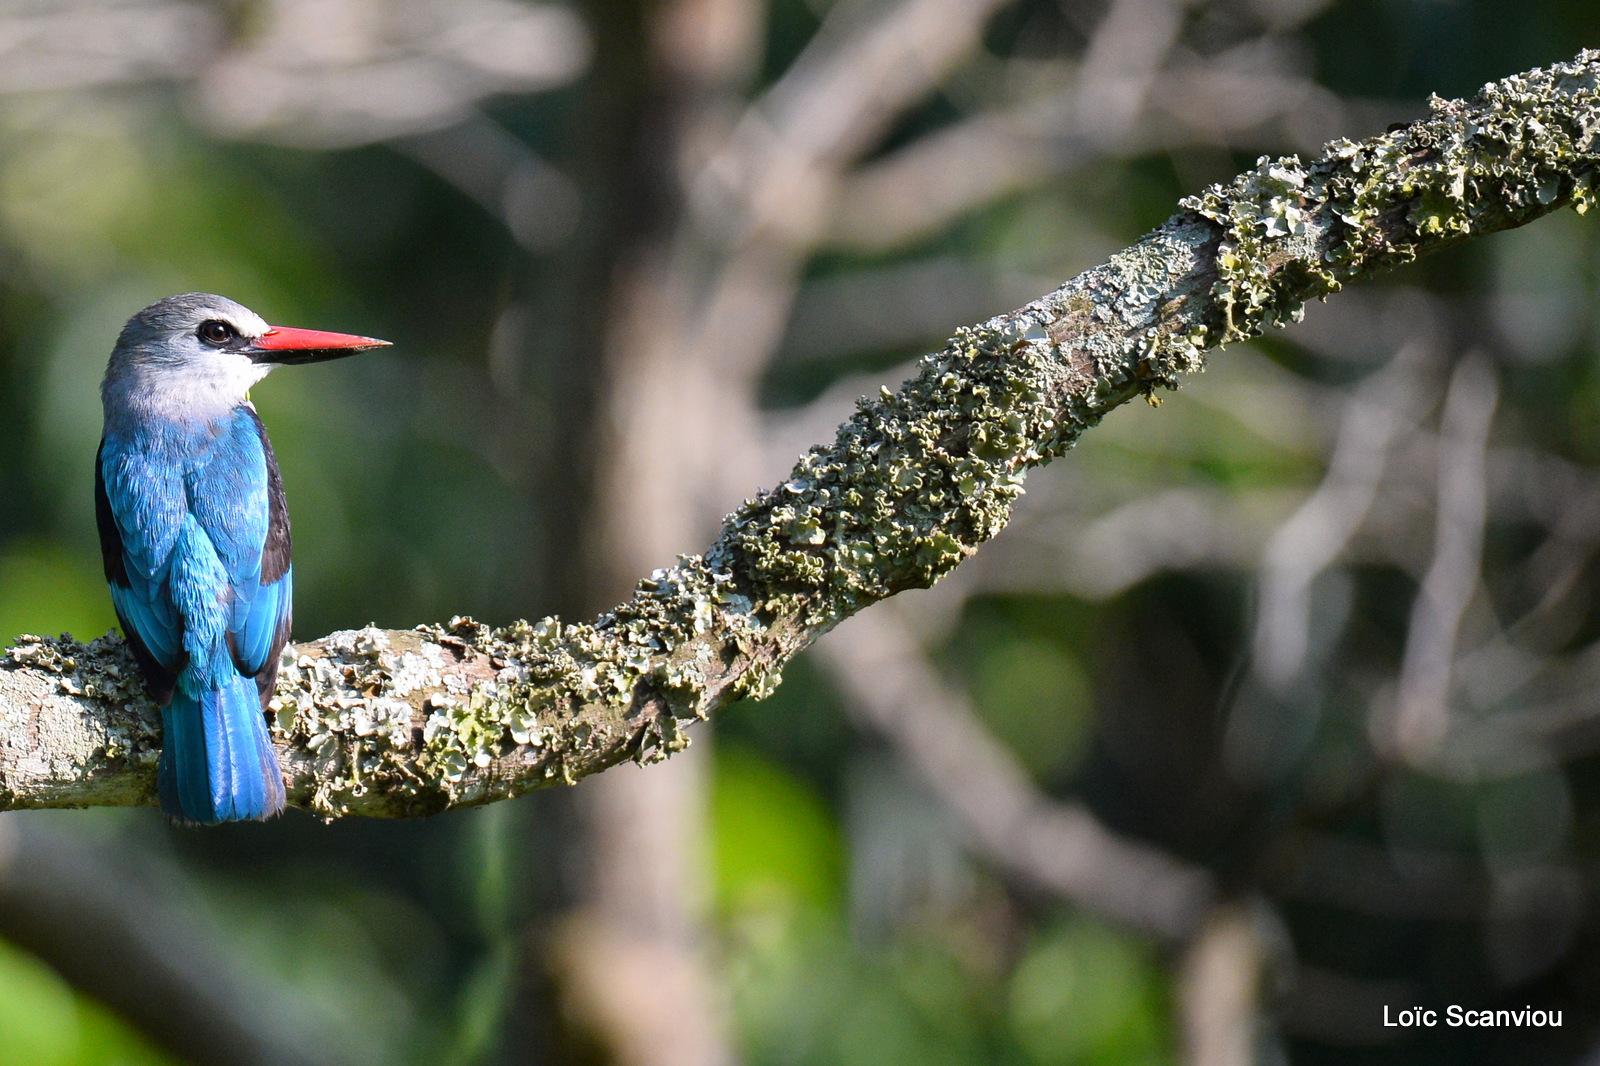 Martin-chasseur du Sénégal/Woodland Kingfisher (1)